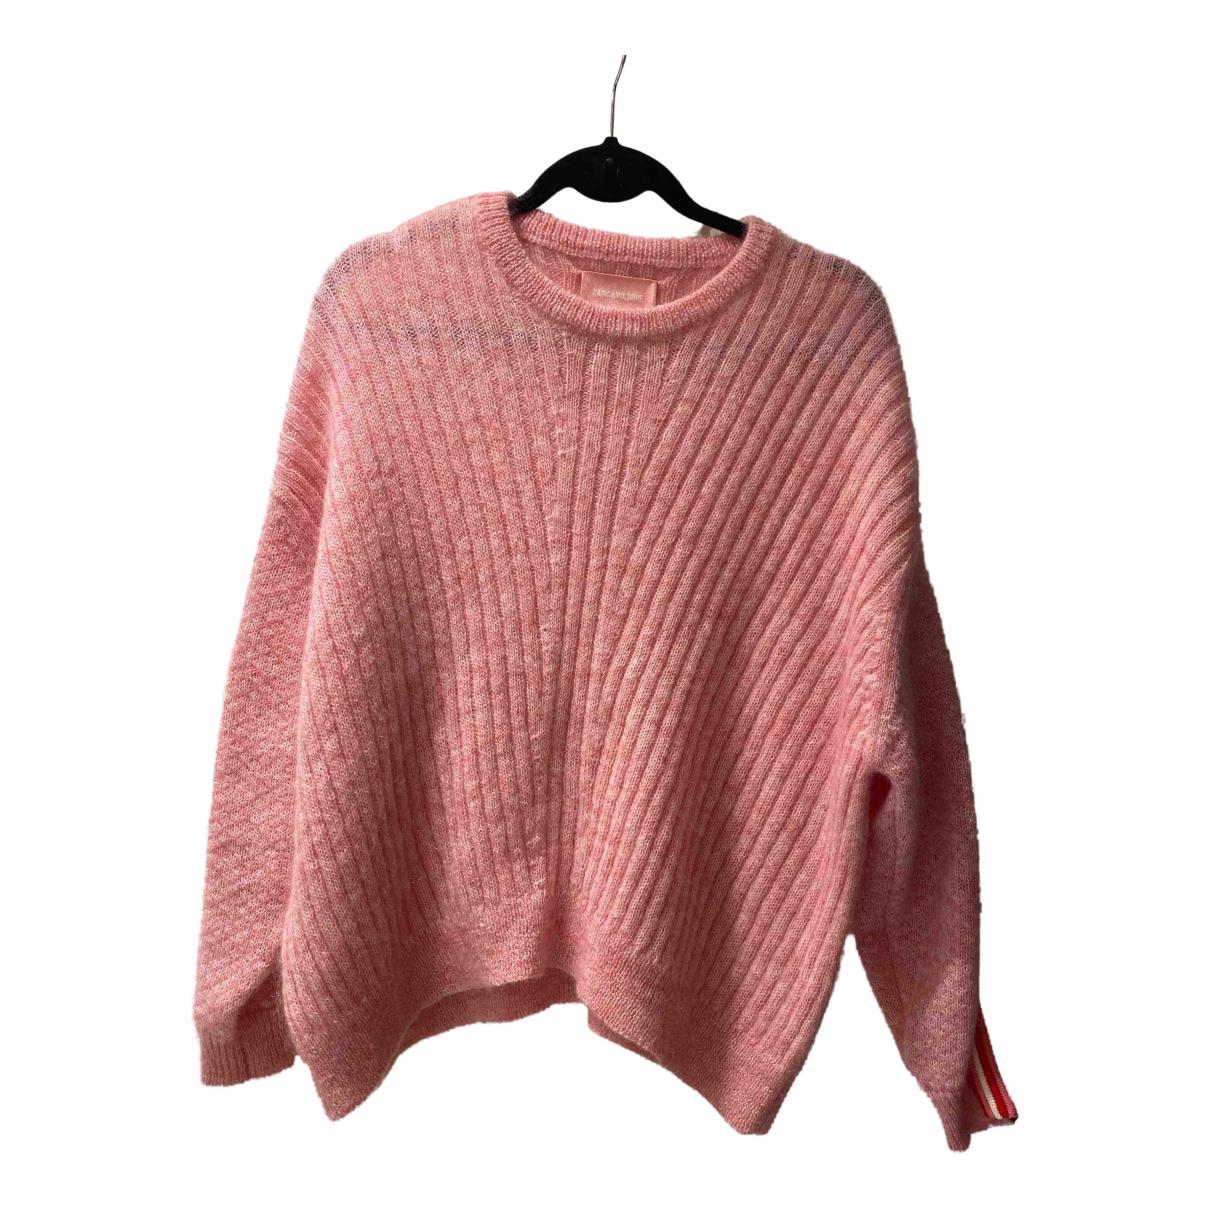 Zadig & Voltaire Fall Winter 2019 Pink Wool Knitwear for Women S International